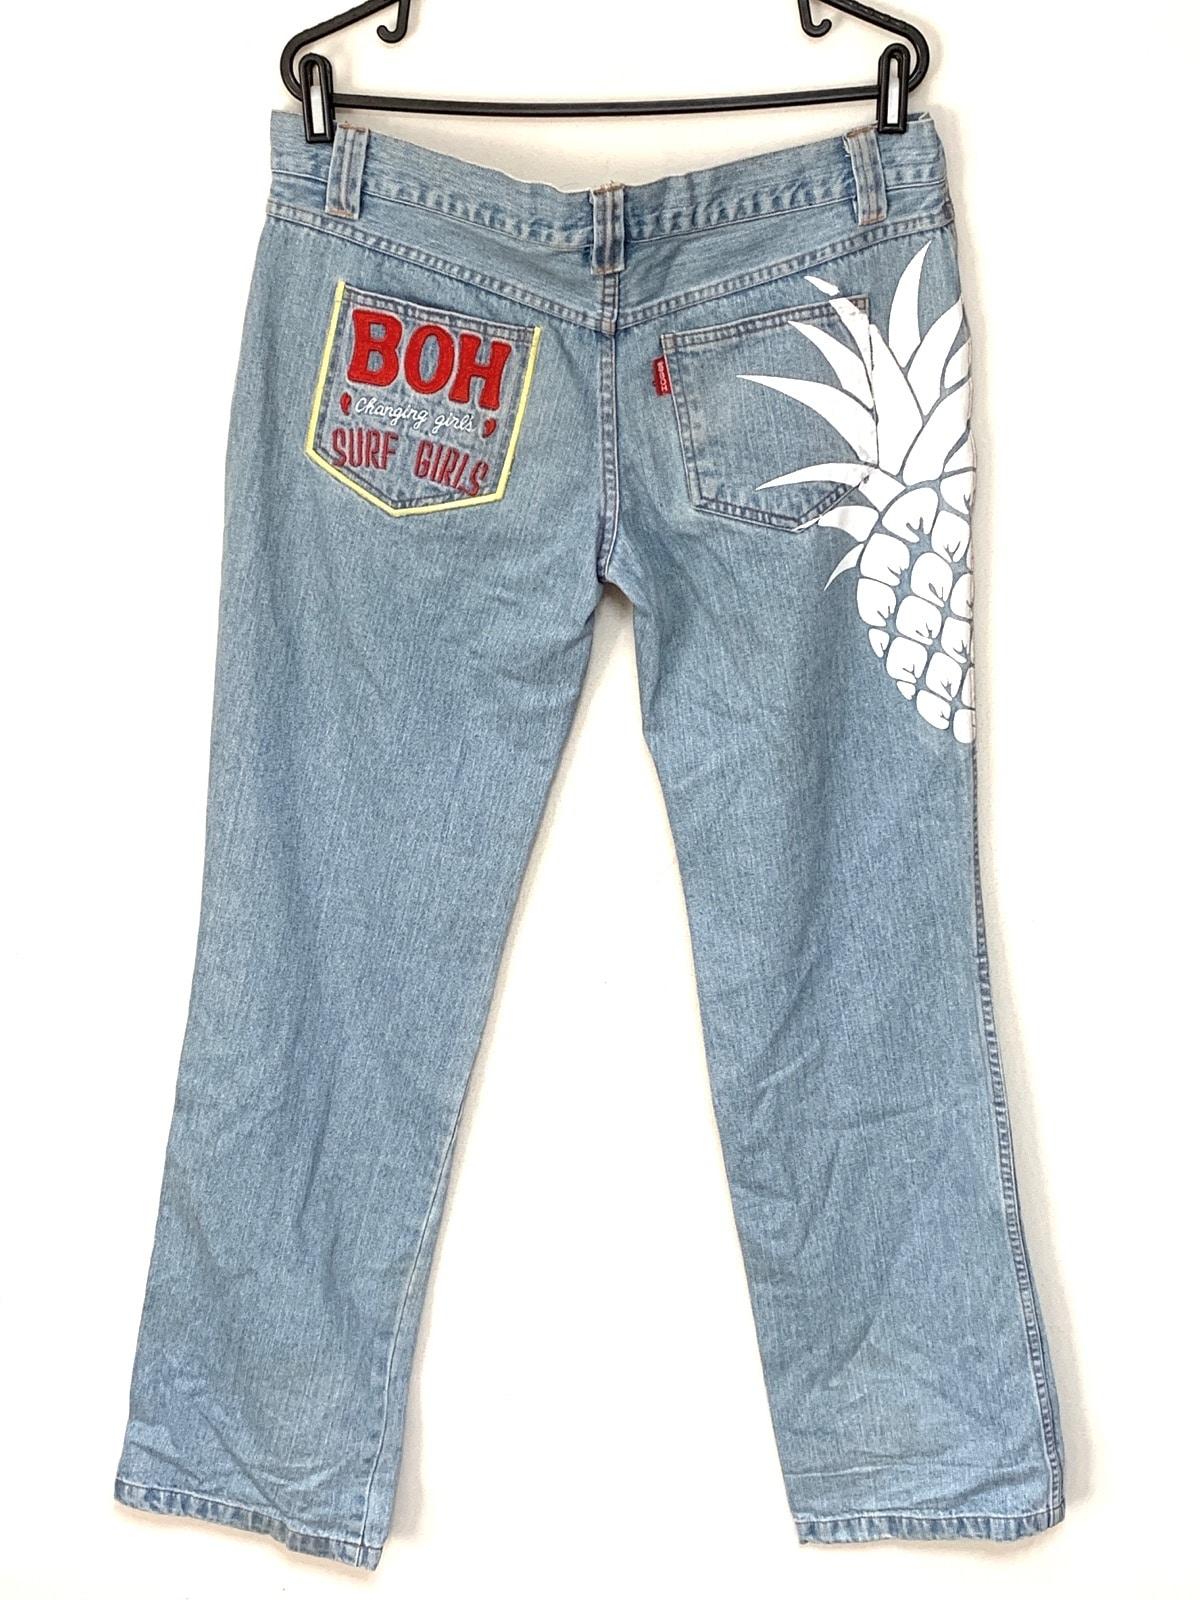 BOH(ボー)のジーンズ